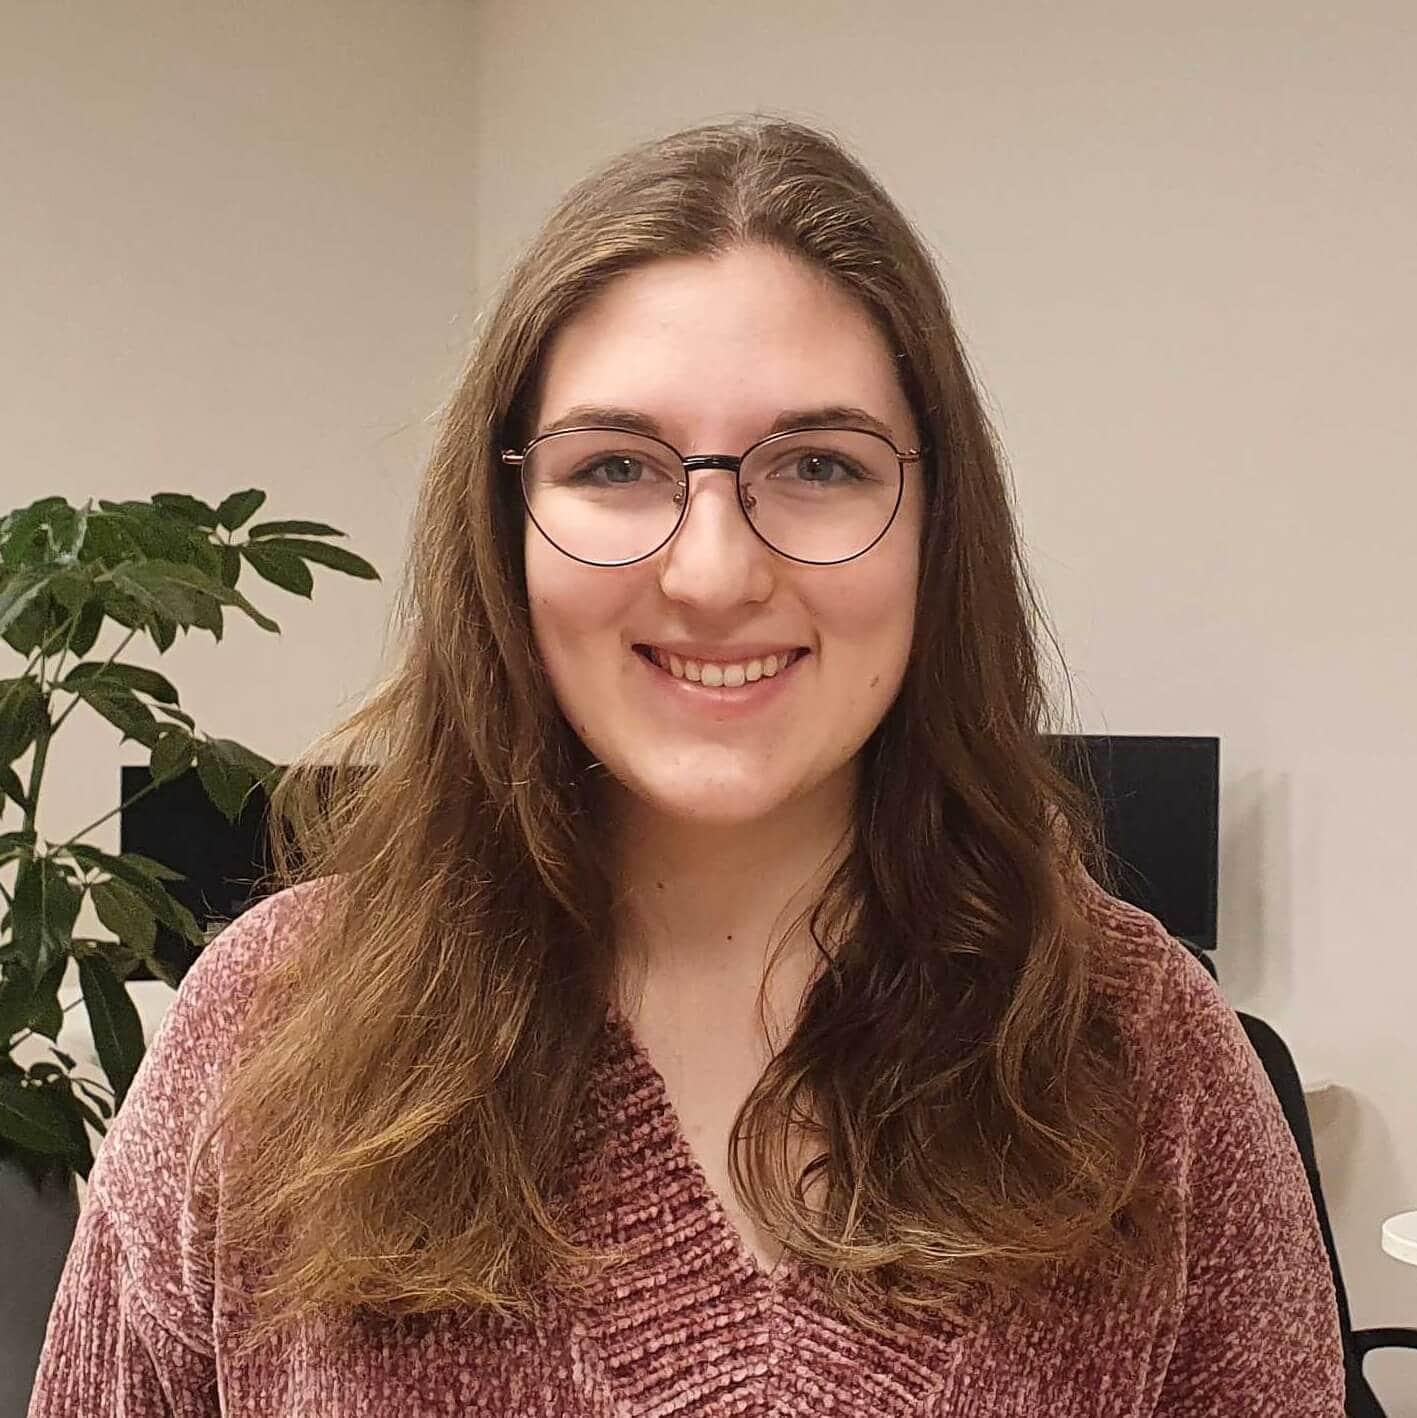 Miriam Mombartz, Sales Development Representative at Morningscore